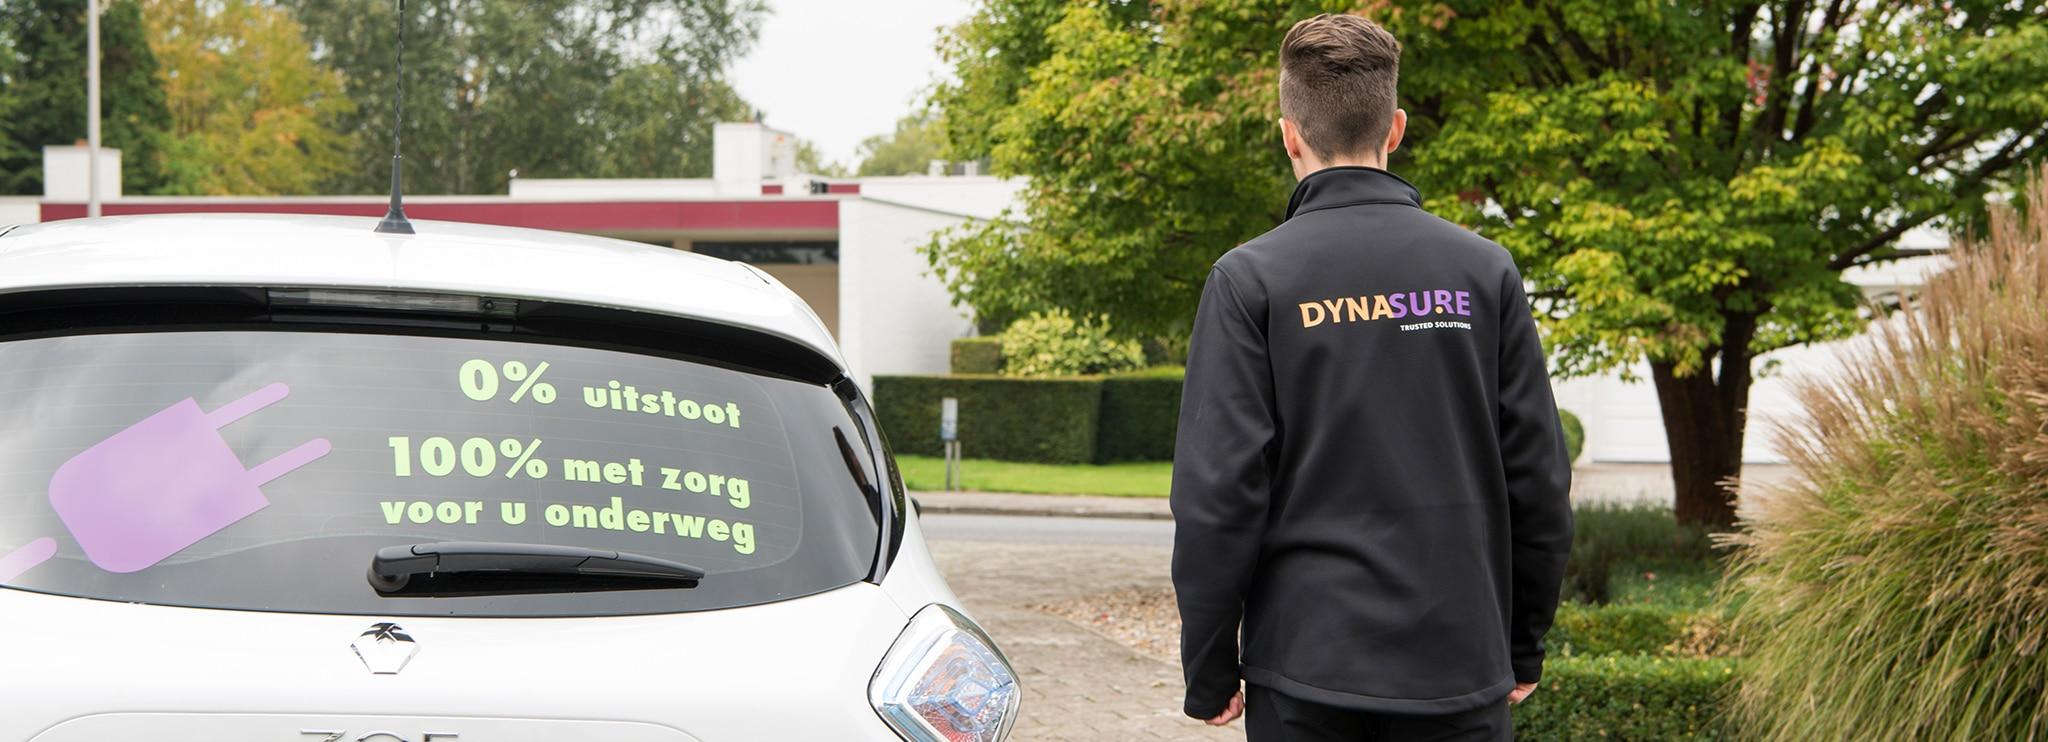 dynasure-bedrijfskleding-suit-up-3